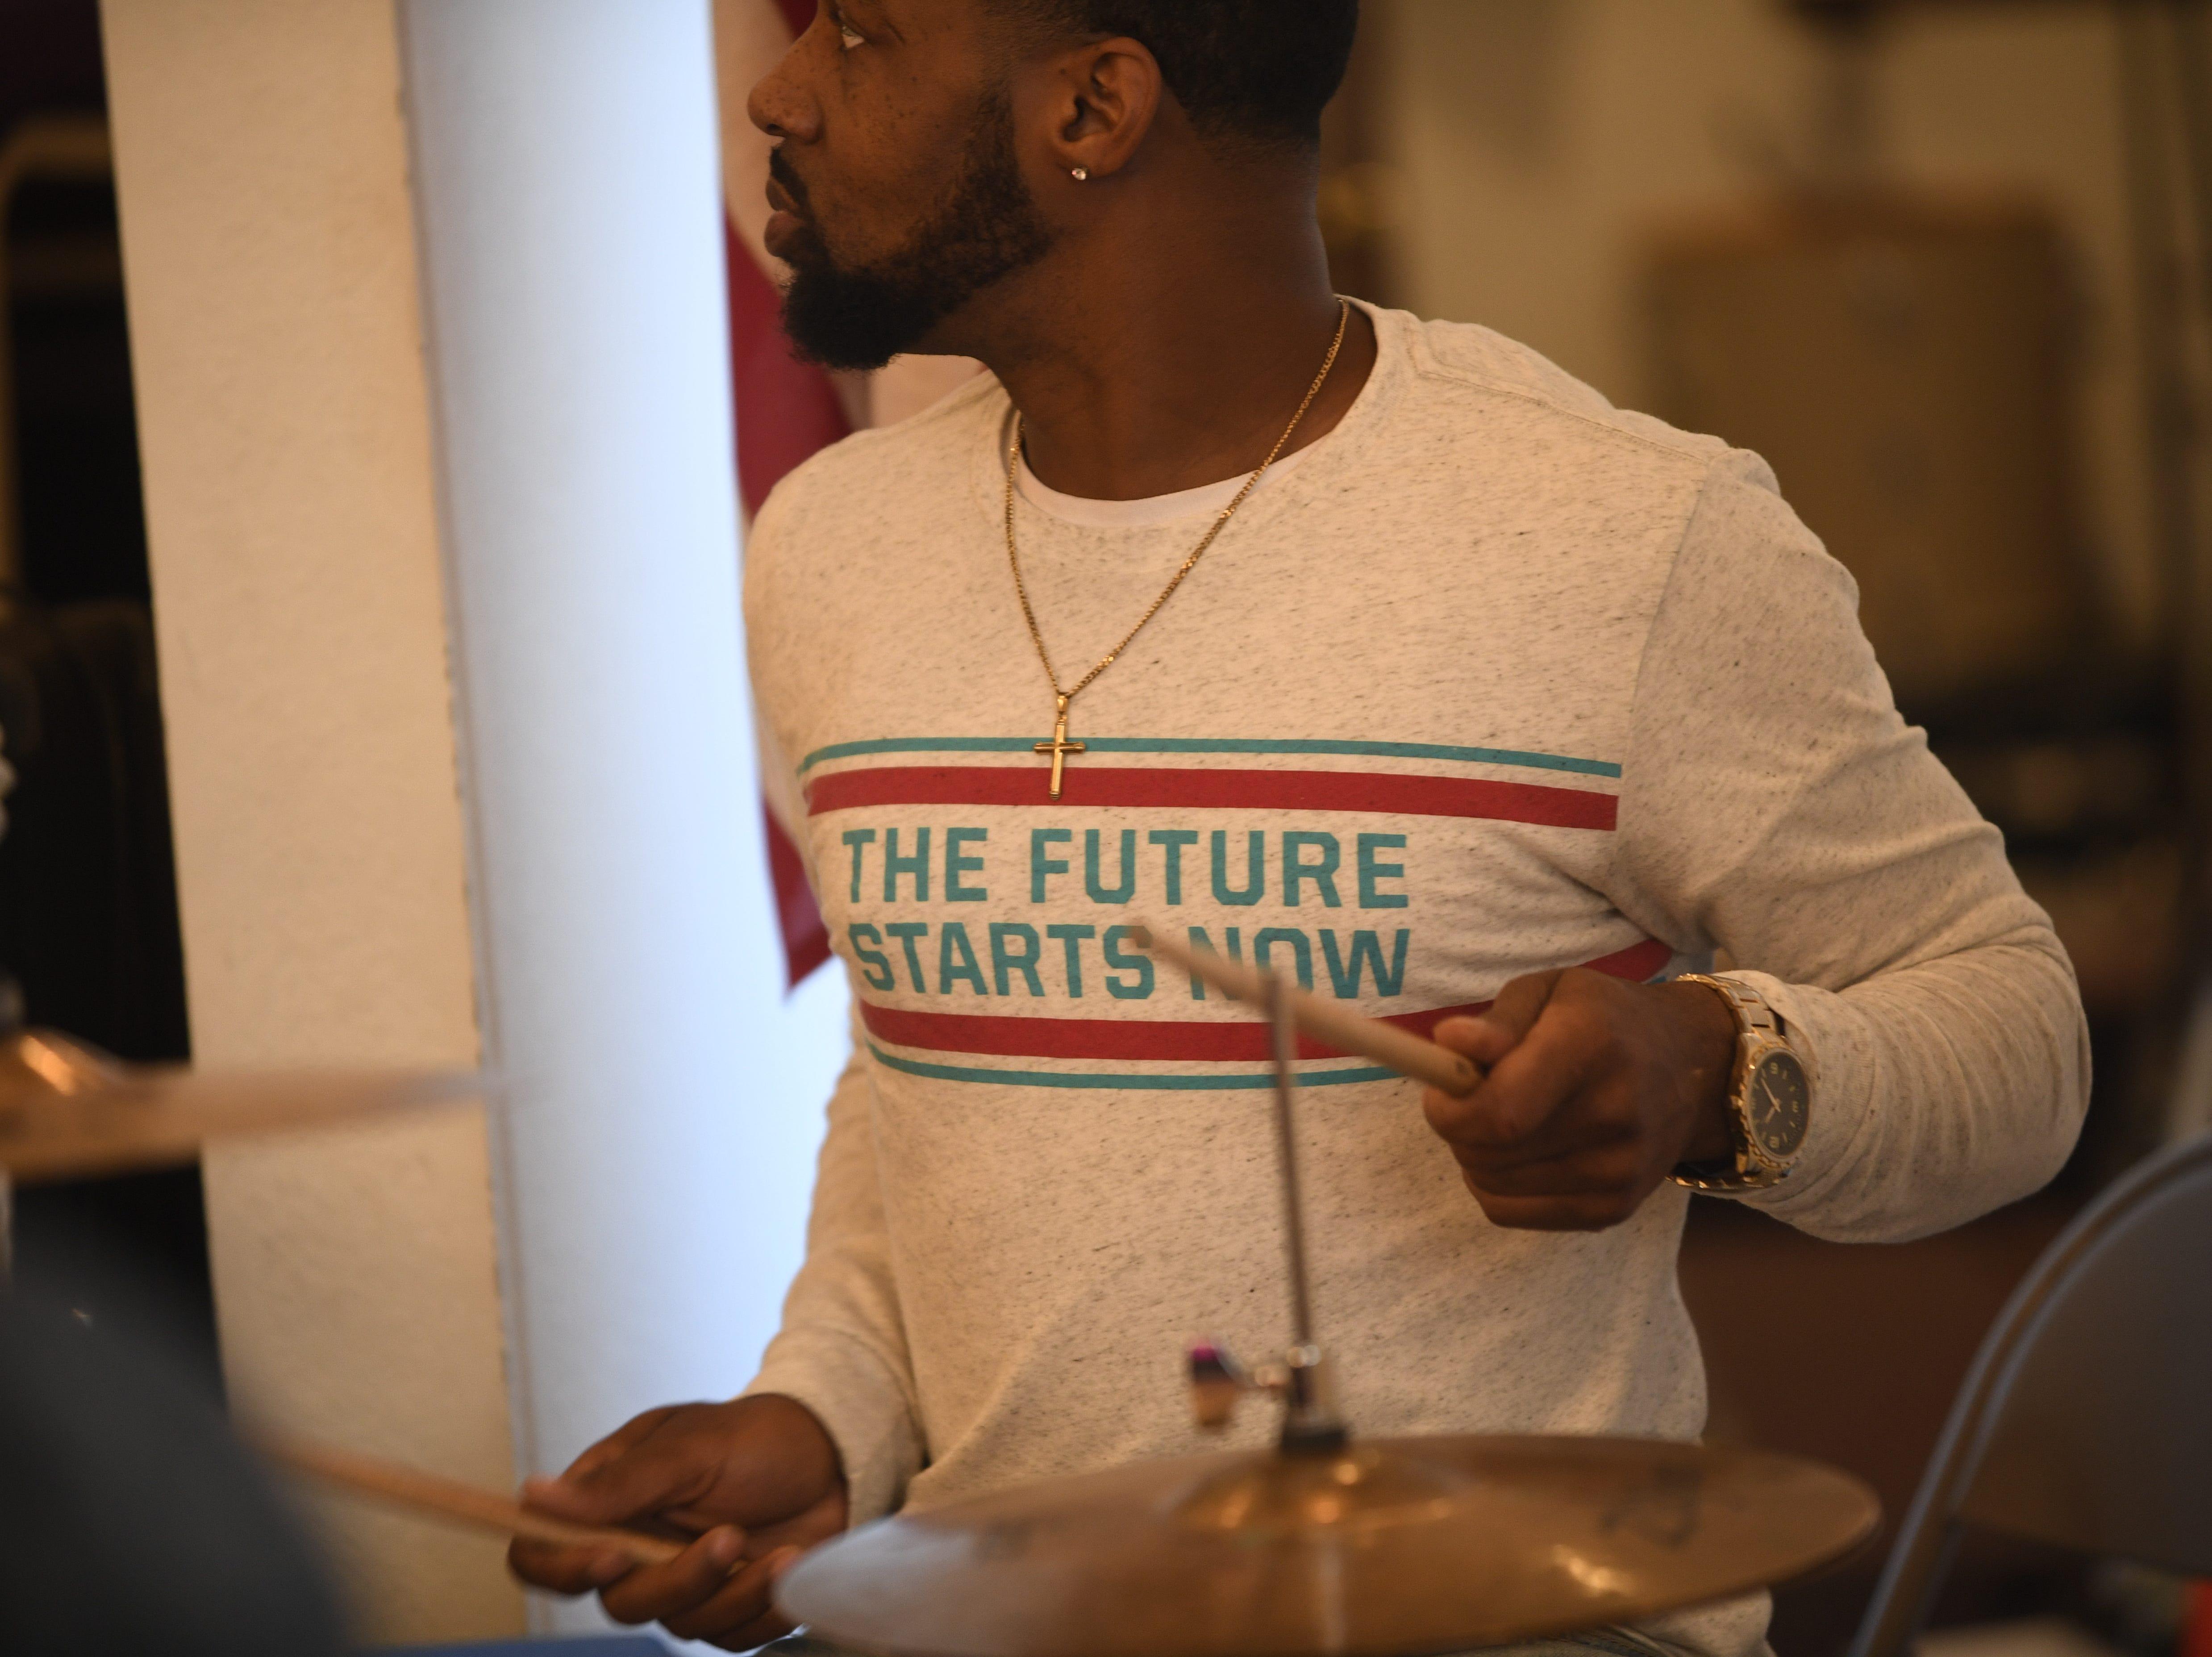 Davaris Anderson plays the drums Mt. Pleasant Church's Black History Month event, in Pinson, Tenn. Feb 24, 2019.